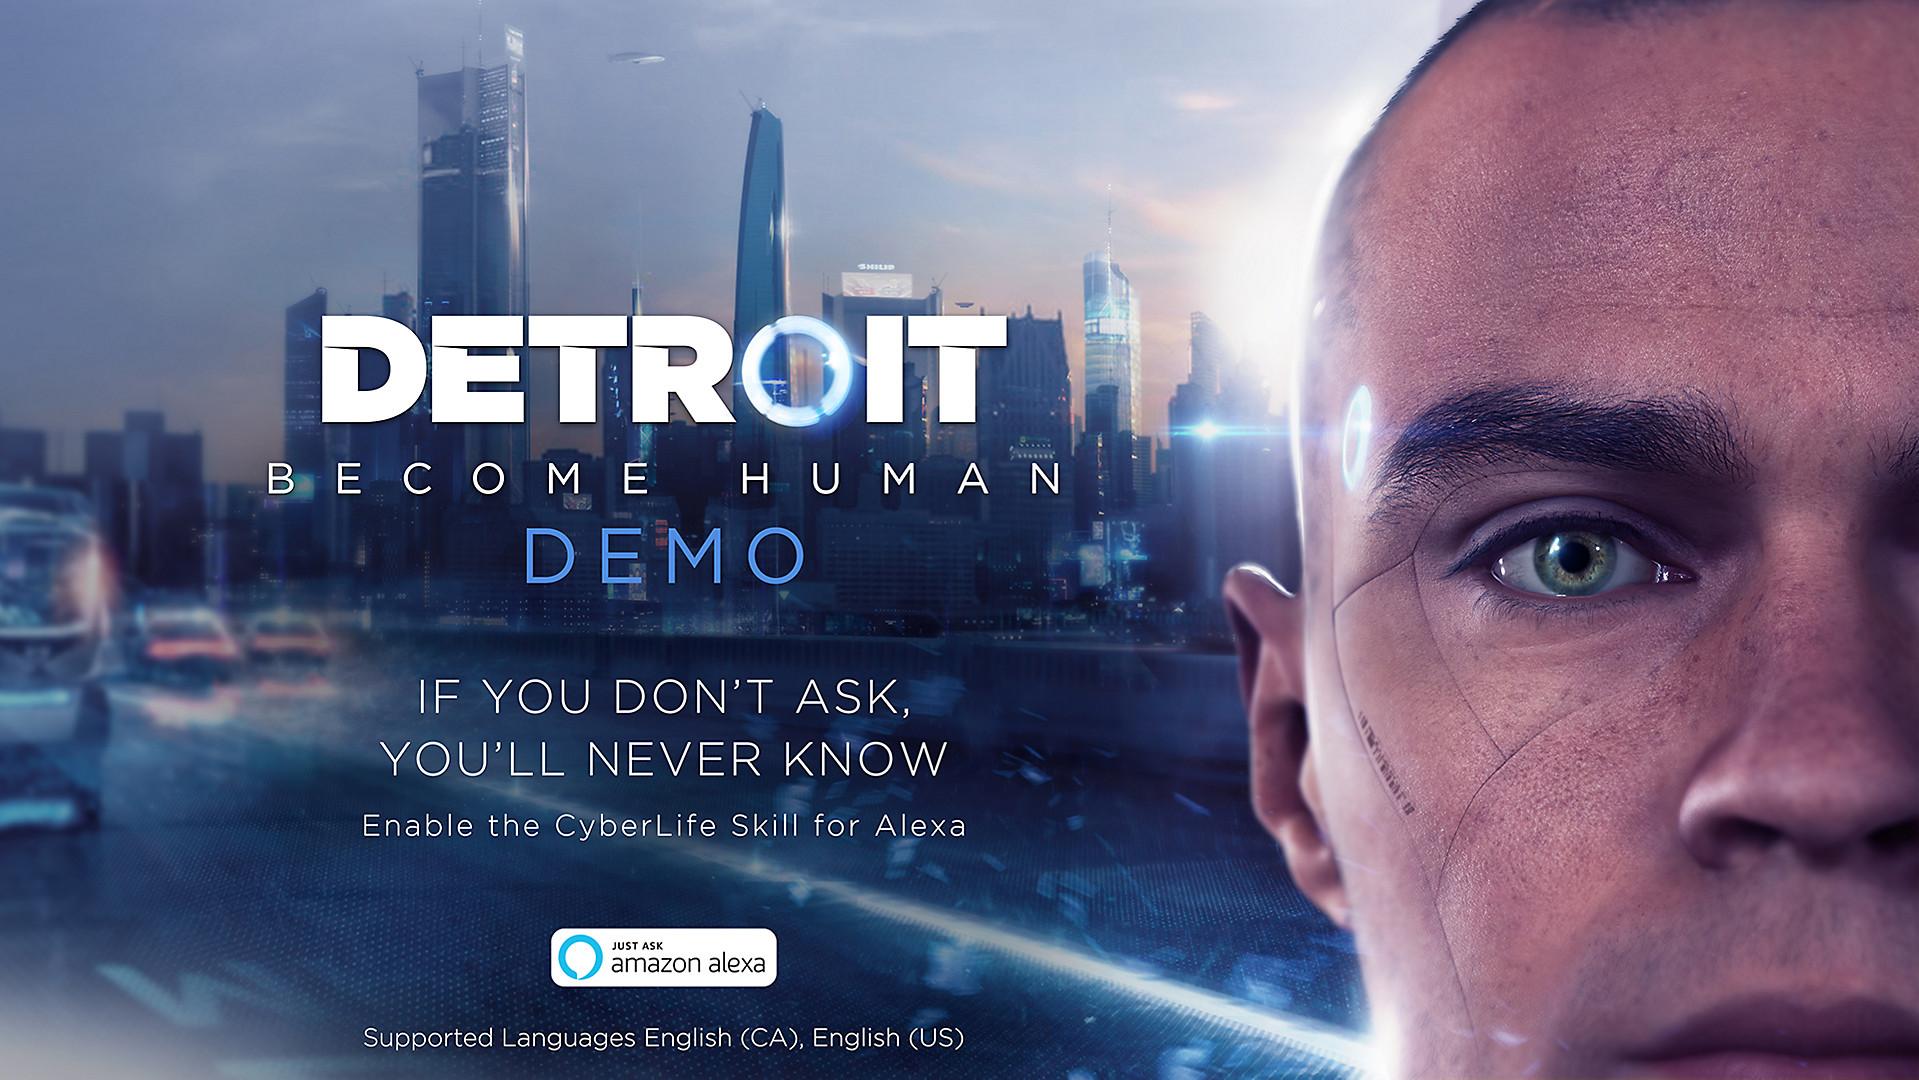 detroit-become-human-demo-image-block-20apr18.jpg